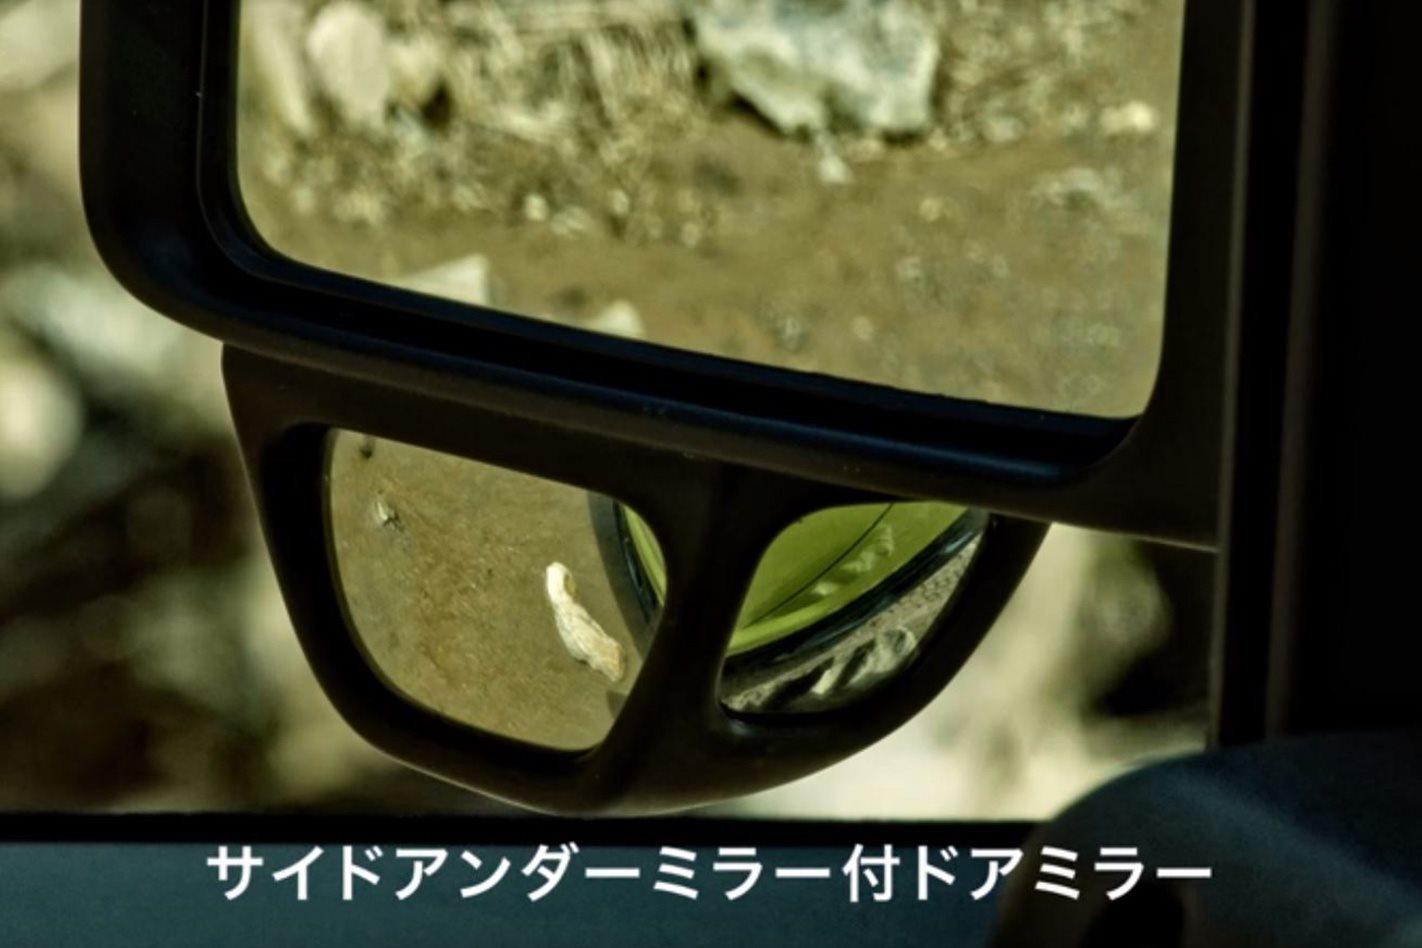 2019 Suzuki Jimny Confirmed More Details Revealed